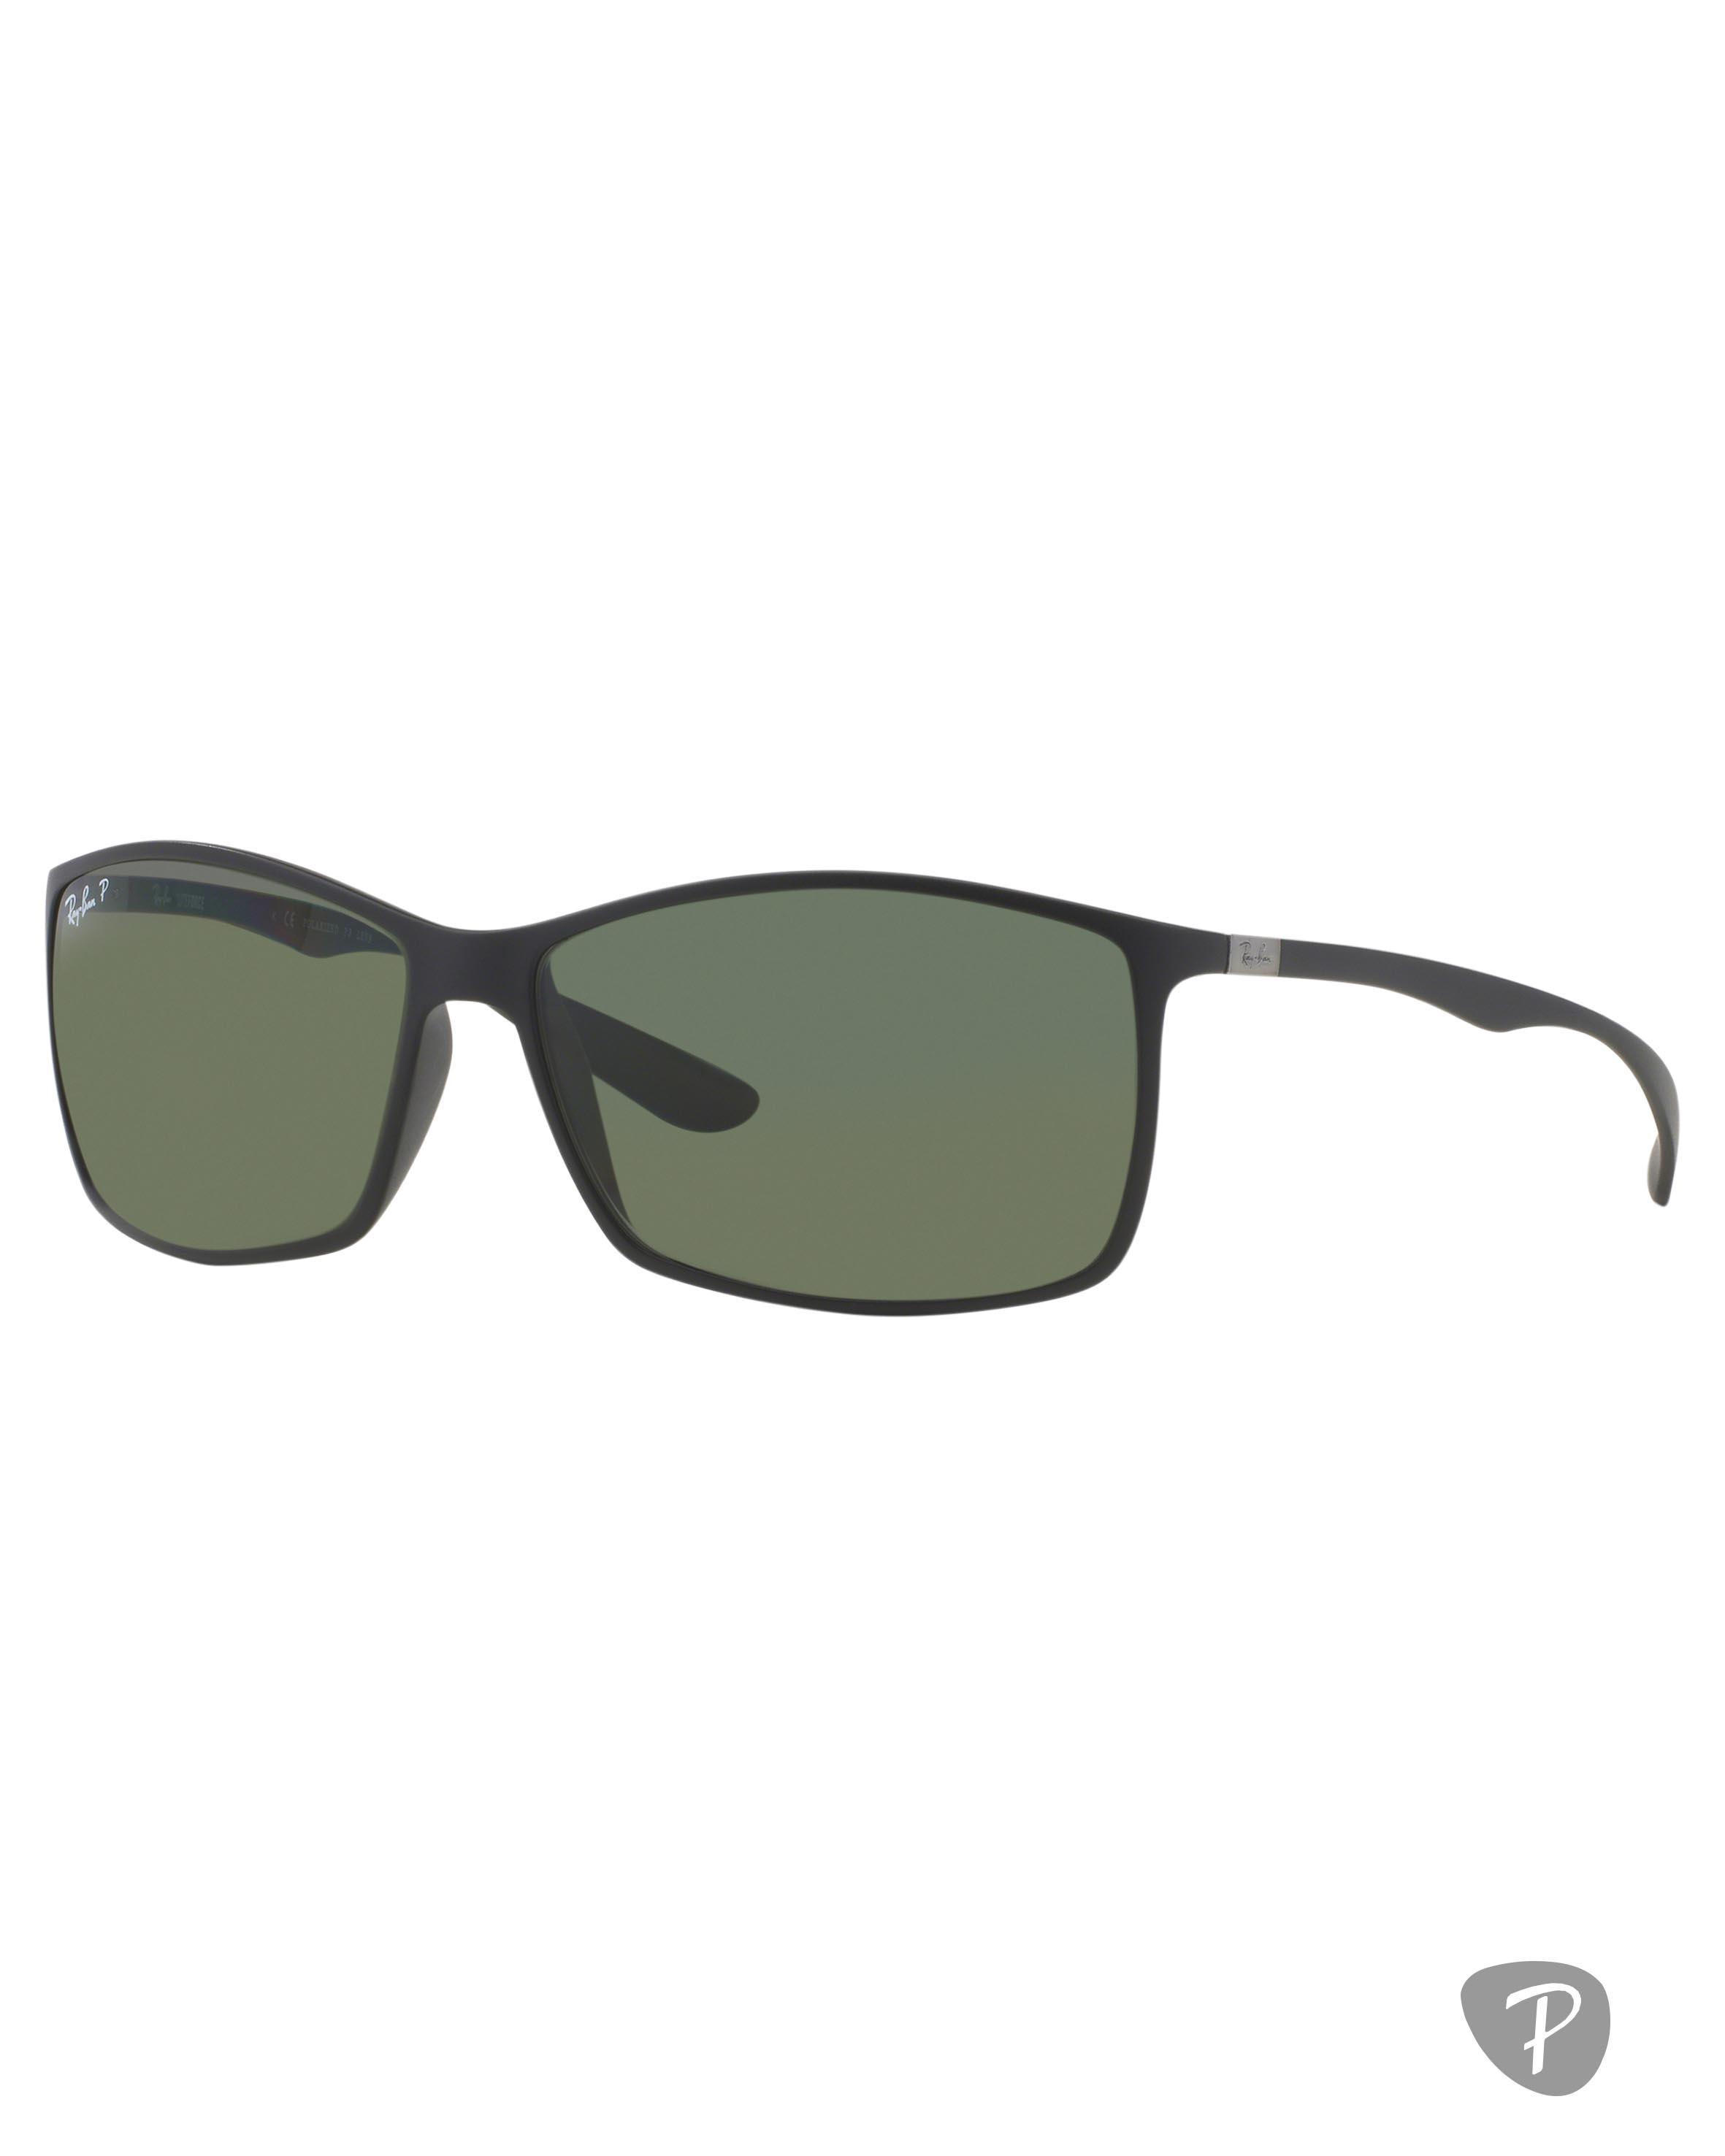 ray ban australia sunglasses sale